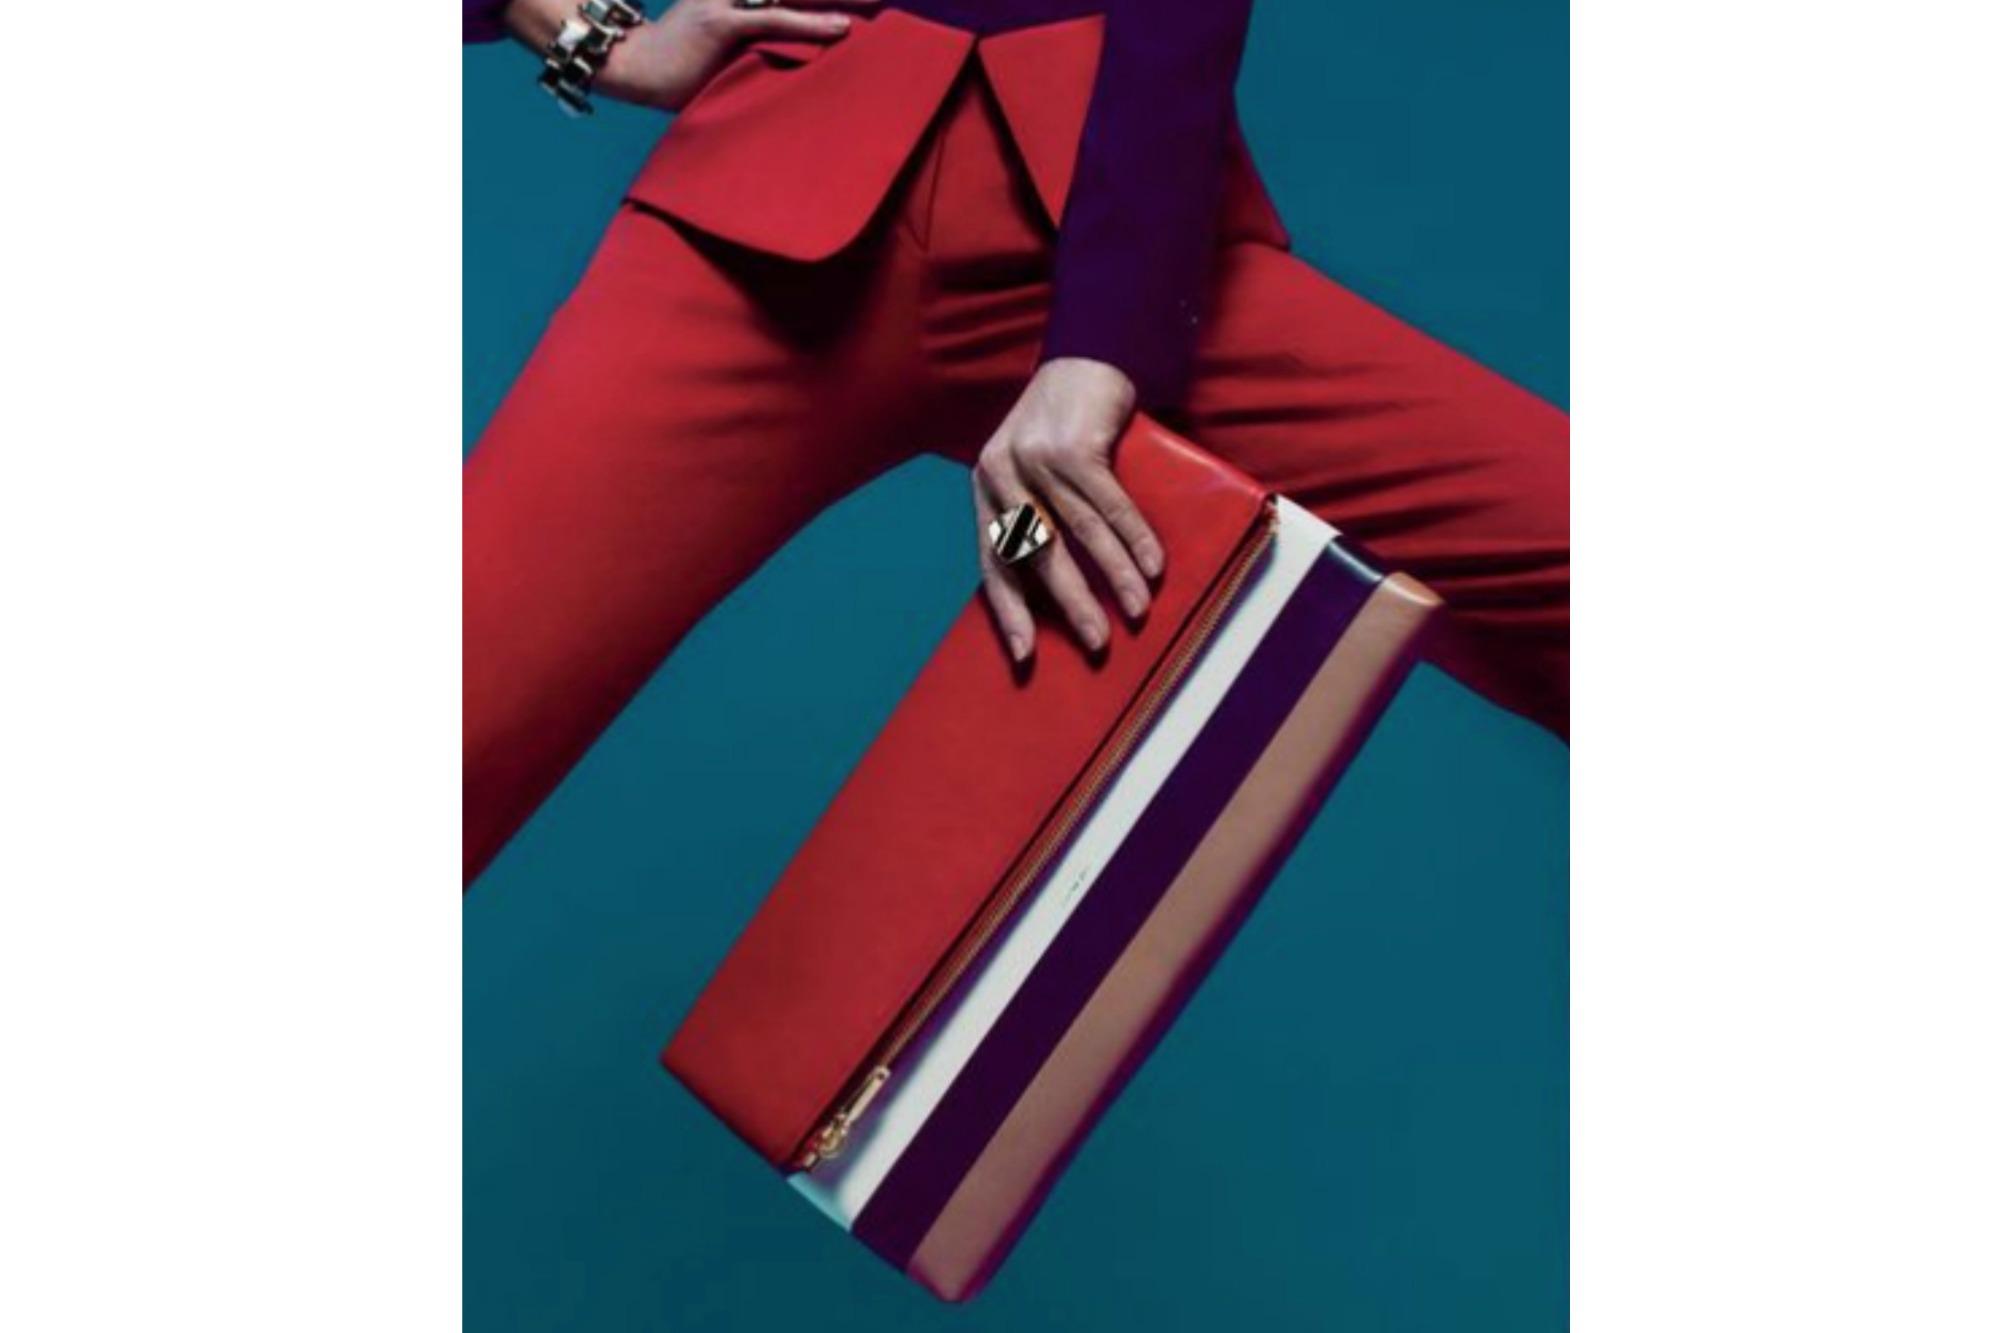 Color-Block Bags